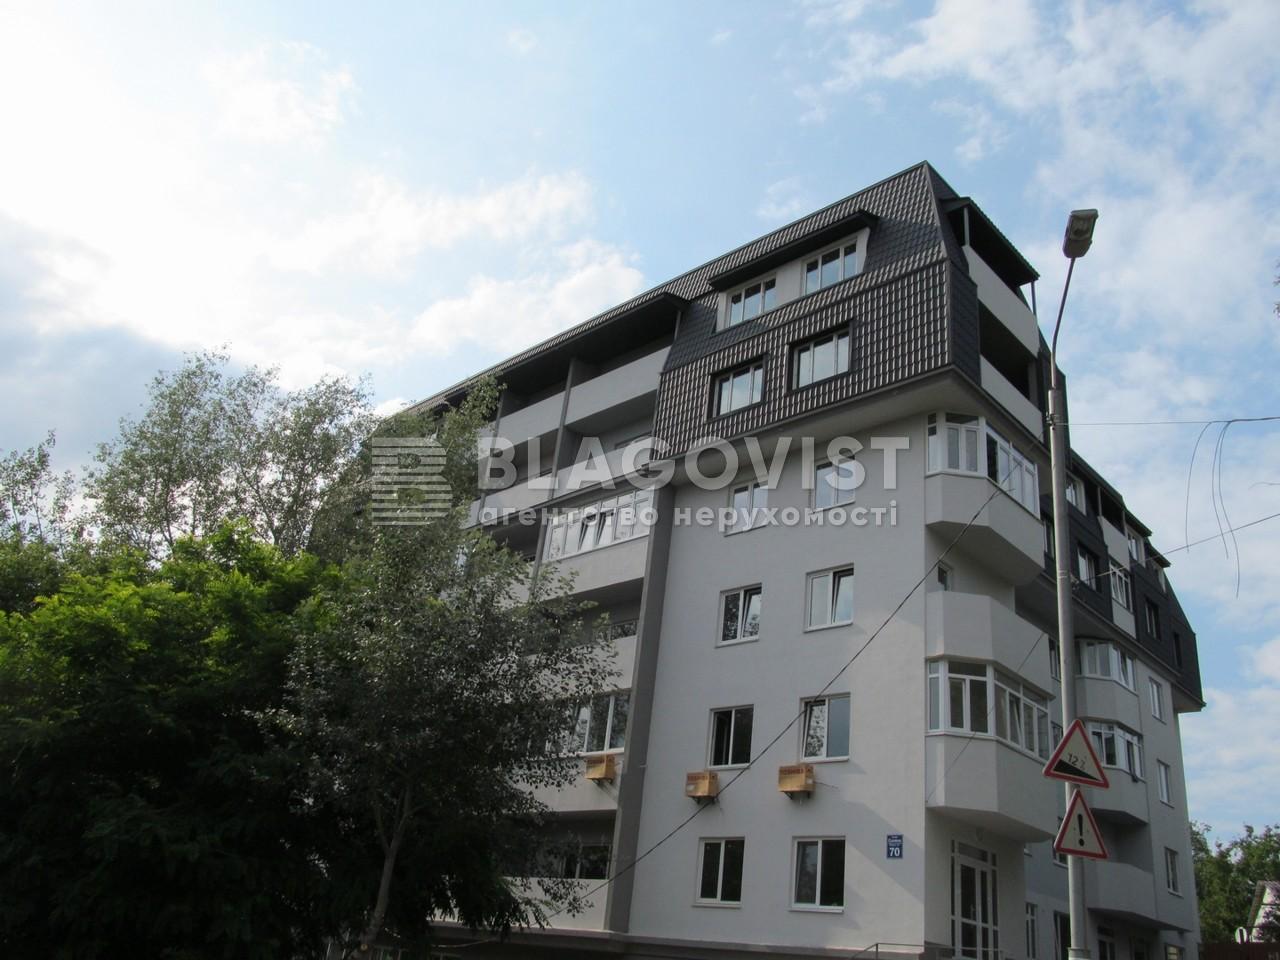 Квартира D-37296, Соляная, 70, Киев - Фото 4